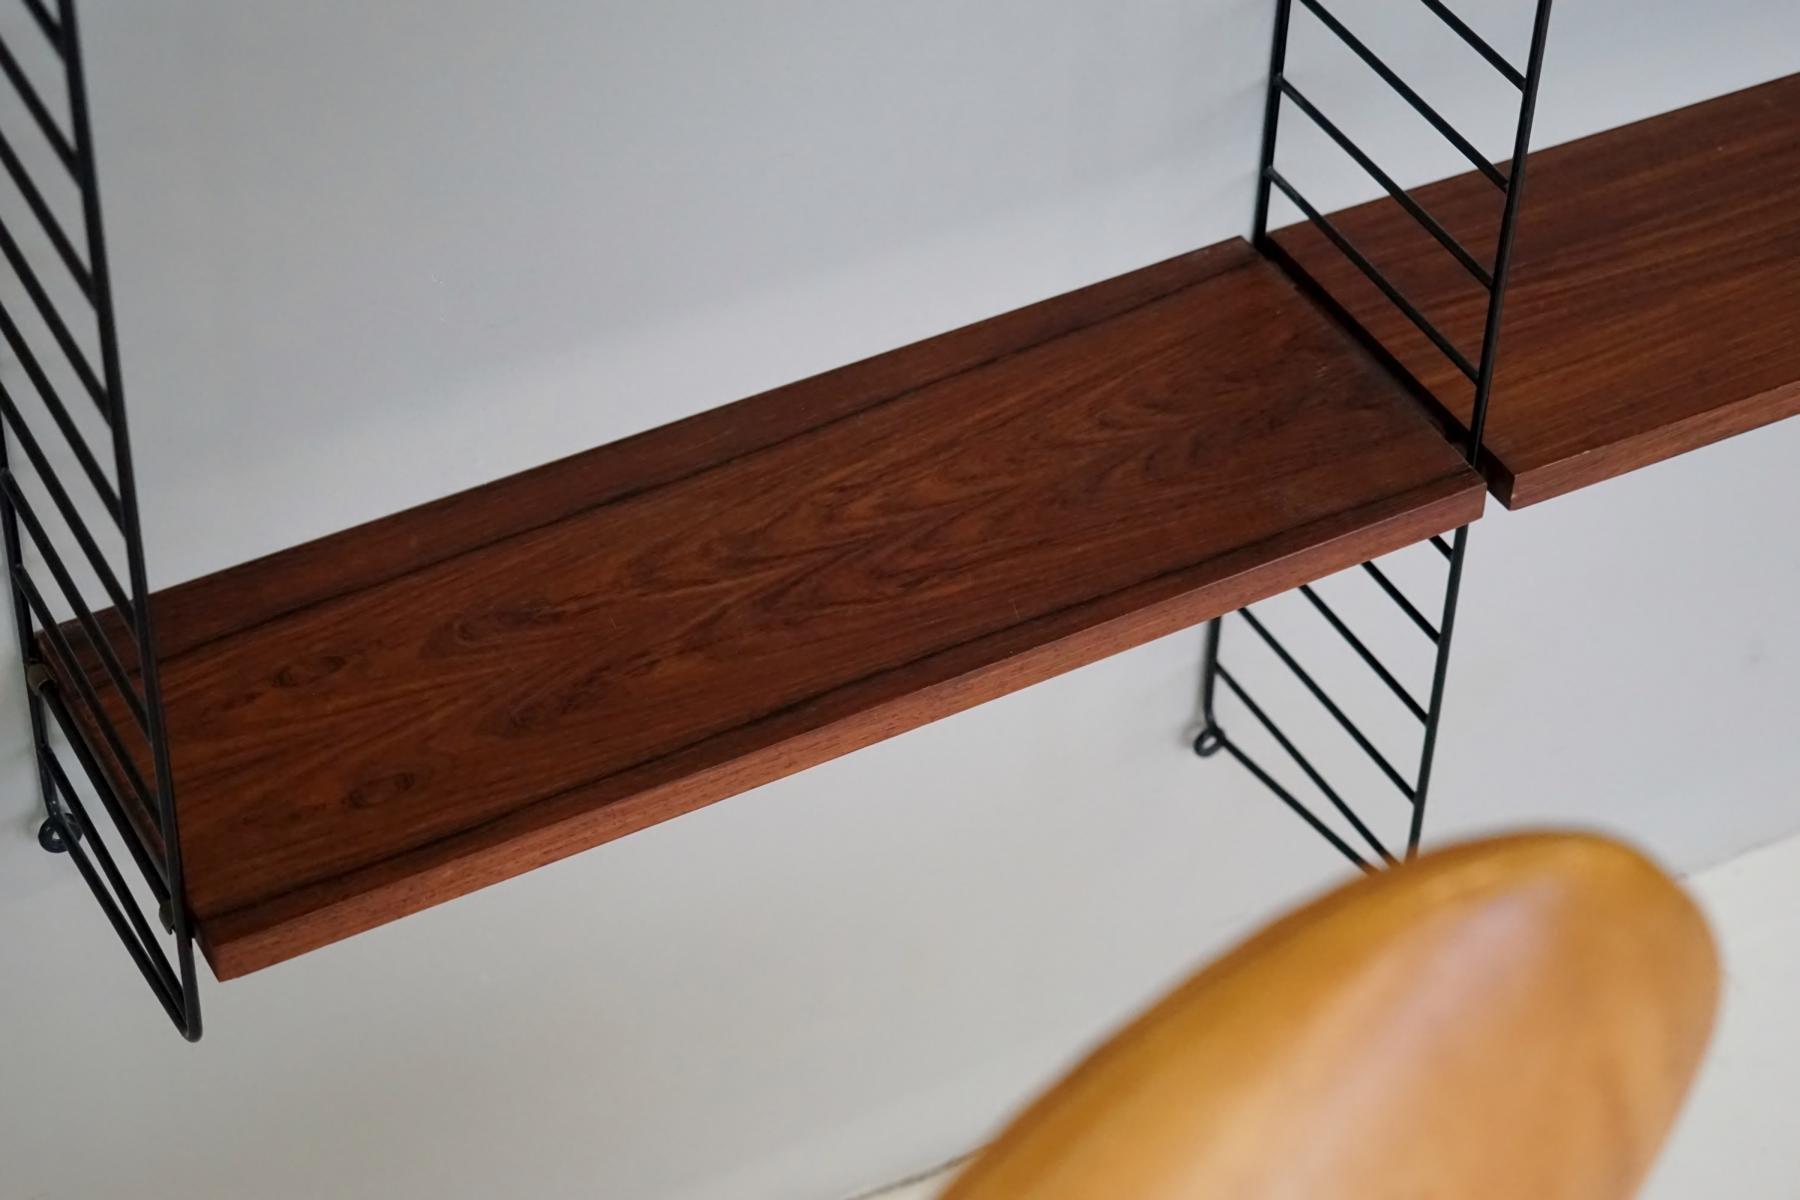 vintage string regal von nisse strinning f r string 1960er bei pamono kaufen. Black Bedroom Furniture Sets. Home Design Ideas